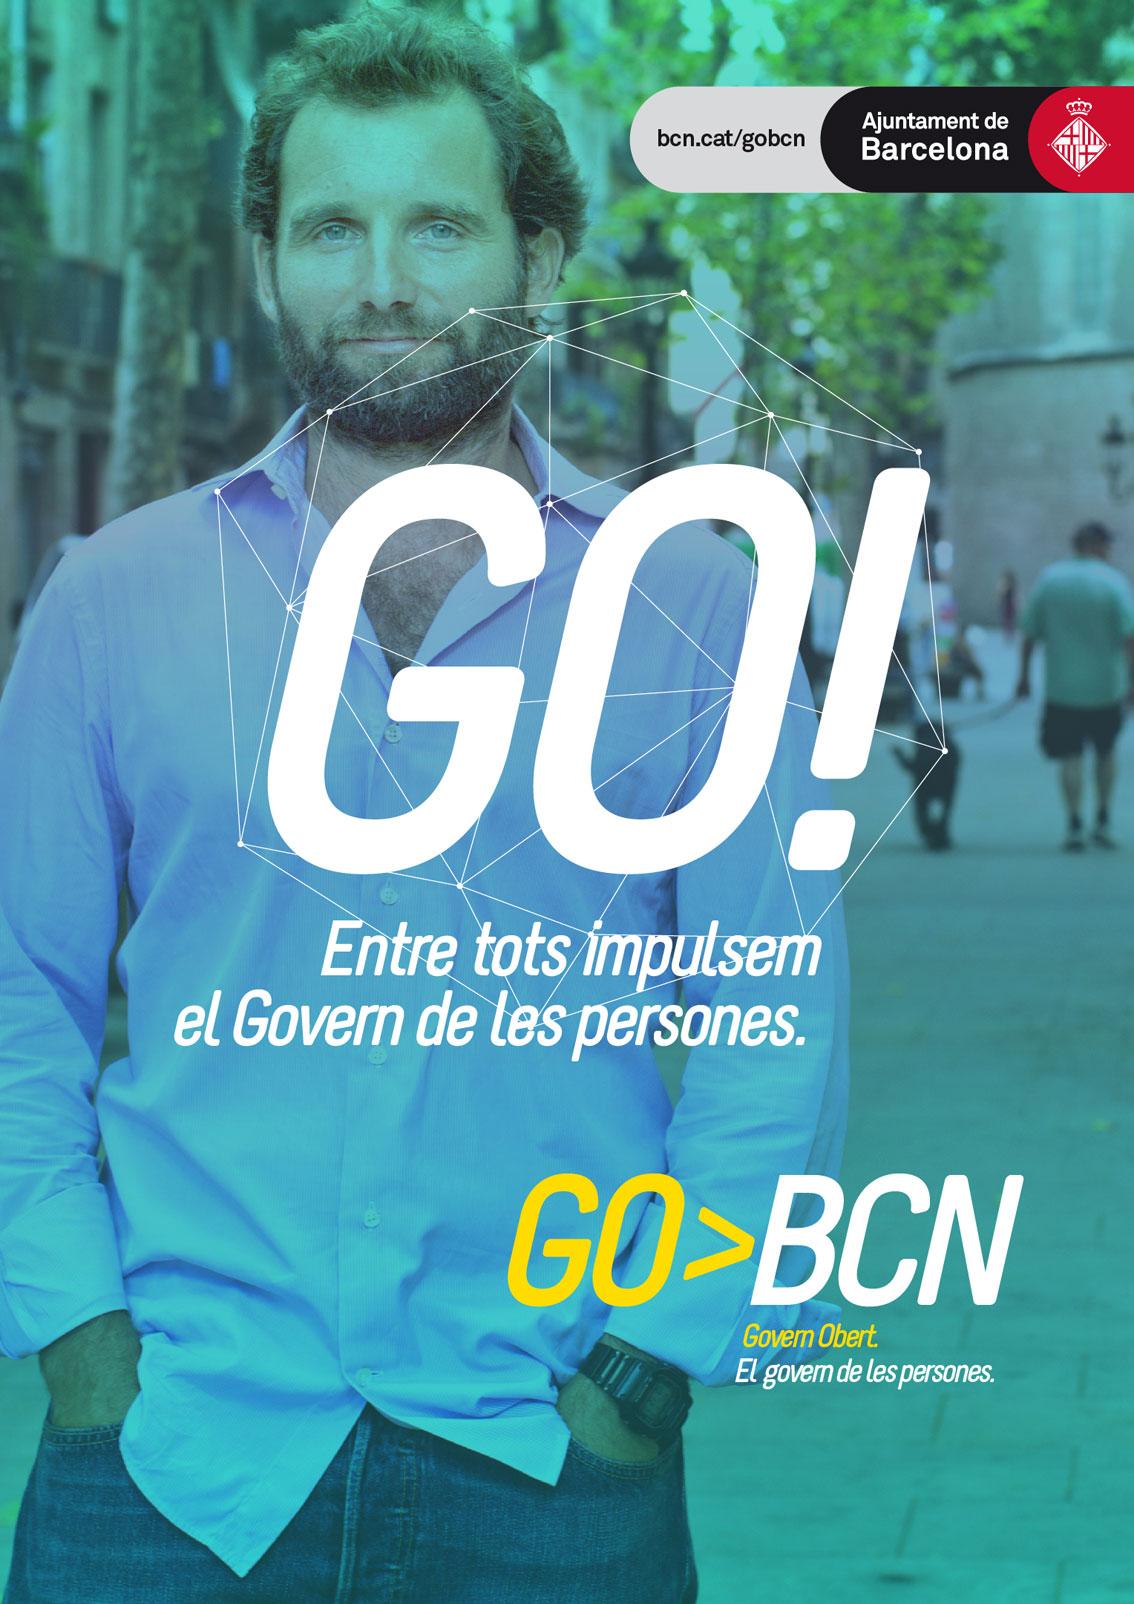 gobcn-05.jpg